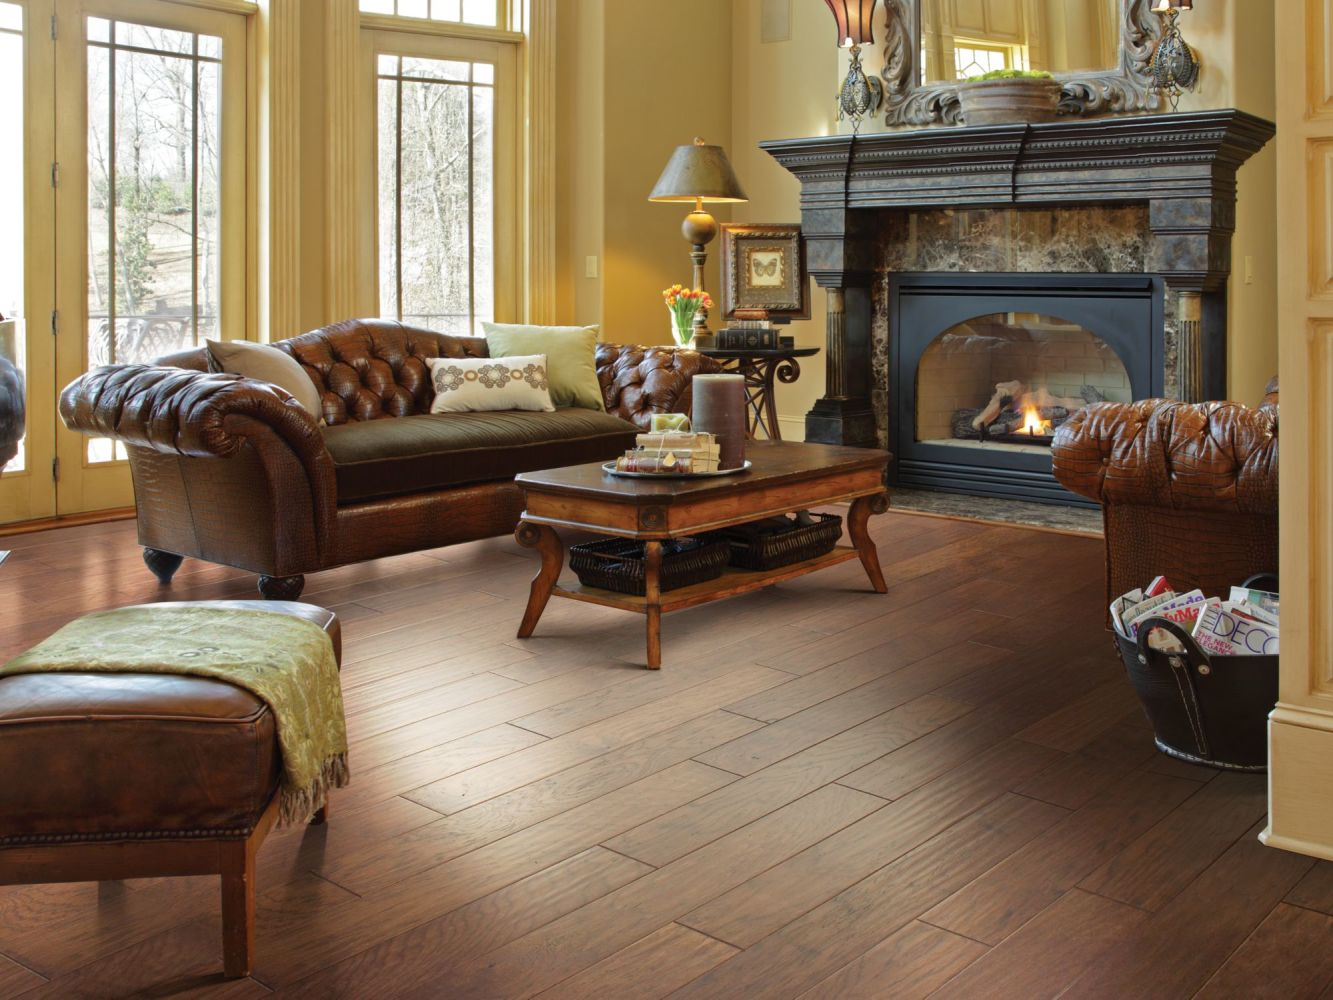 Shaw Floors Village Hardwoods Tanglewood Autumn Breeze 00314_VH022